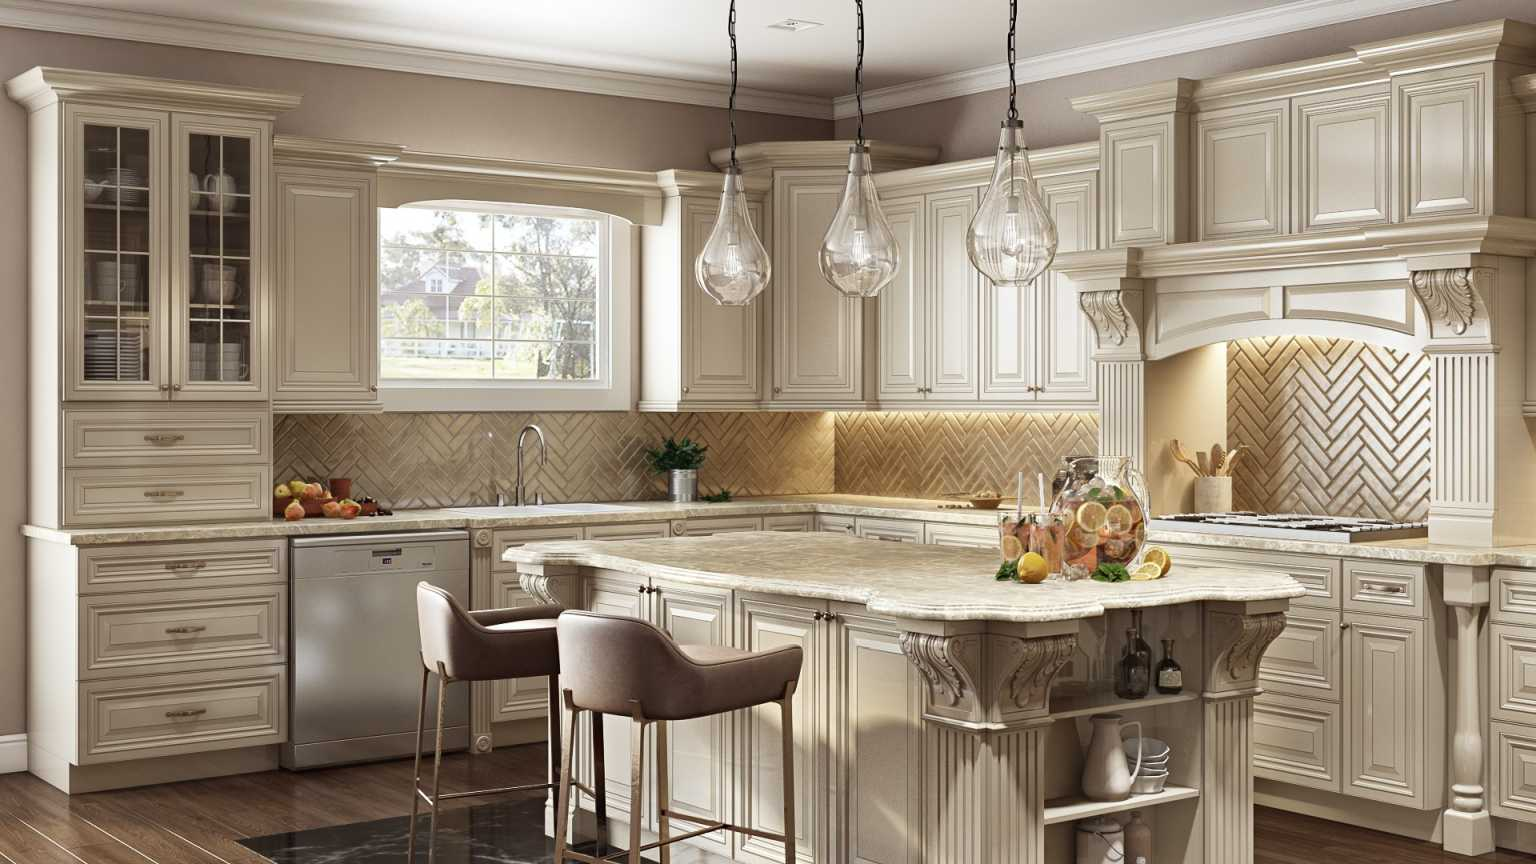 Custom Kitchen Cabinets London Ontario - TK Kitchen & Cabinets